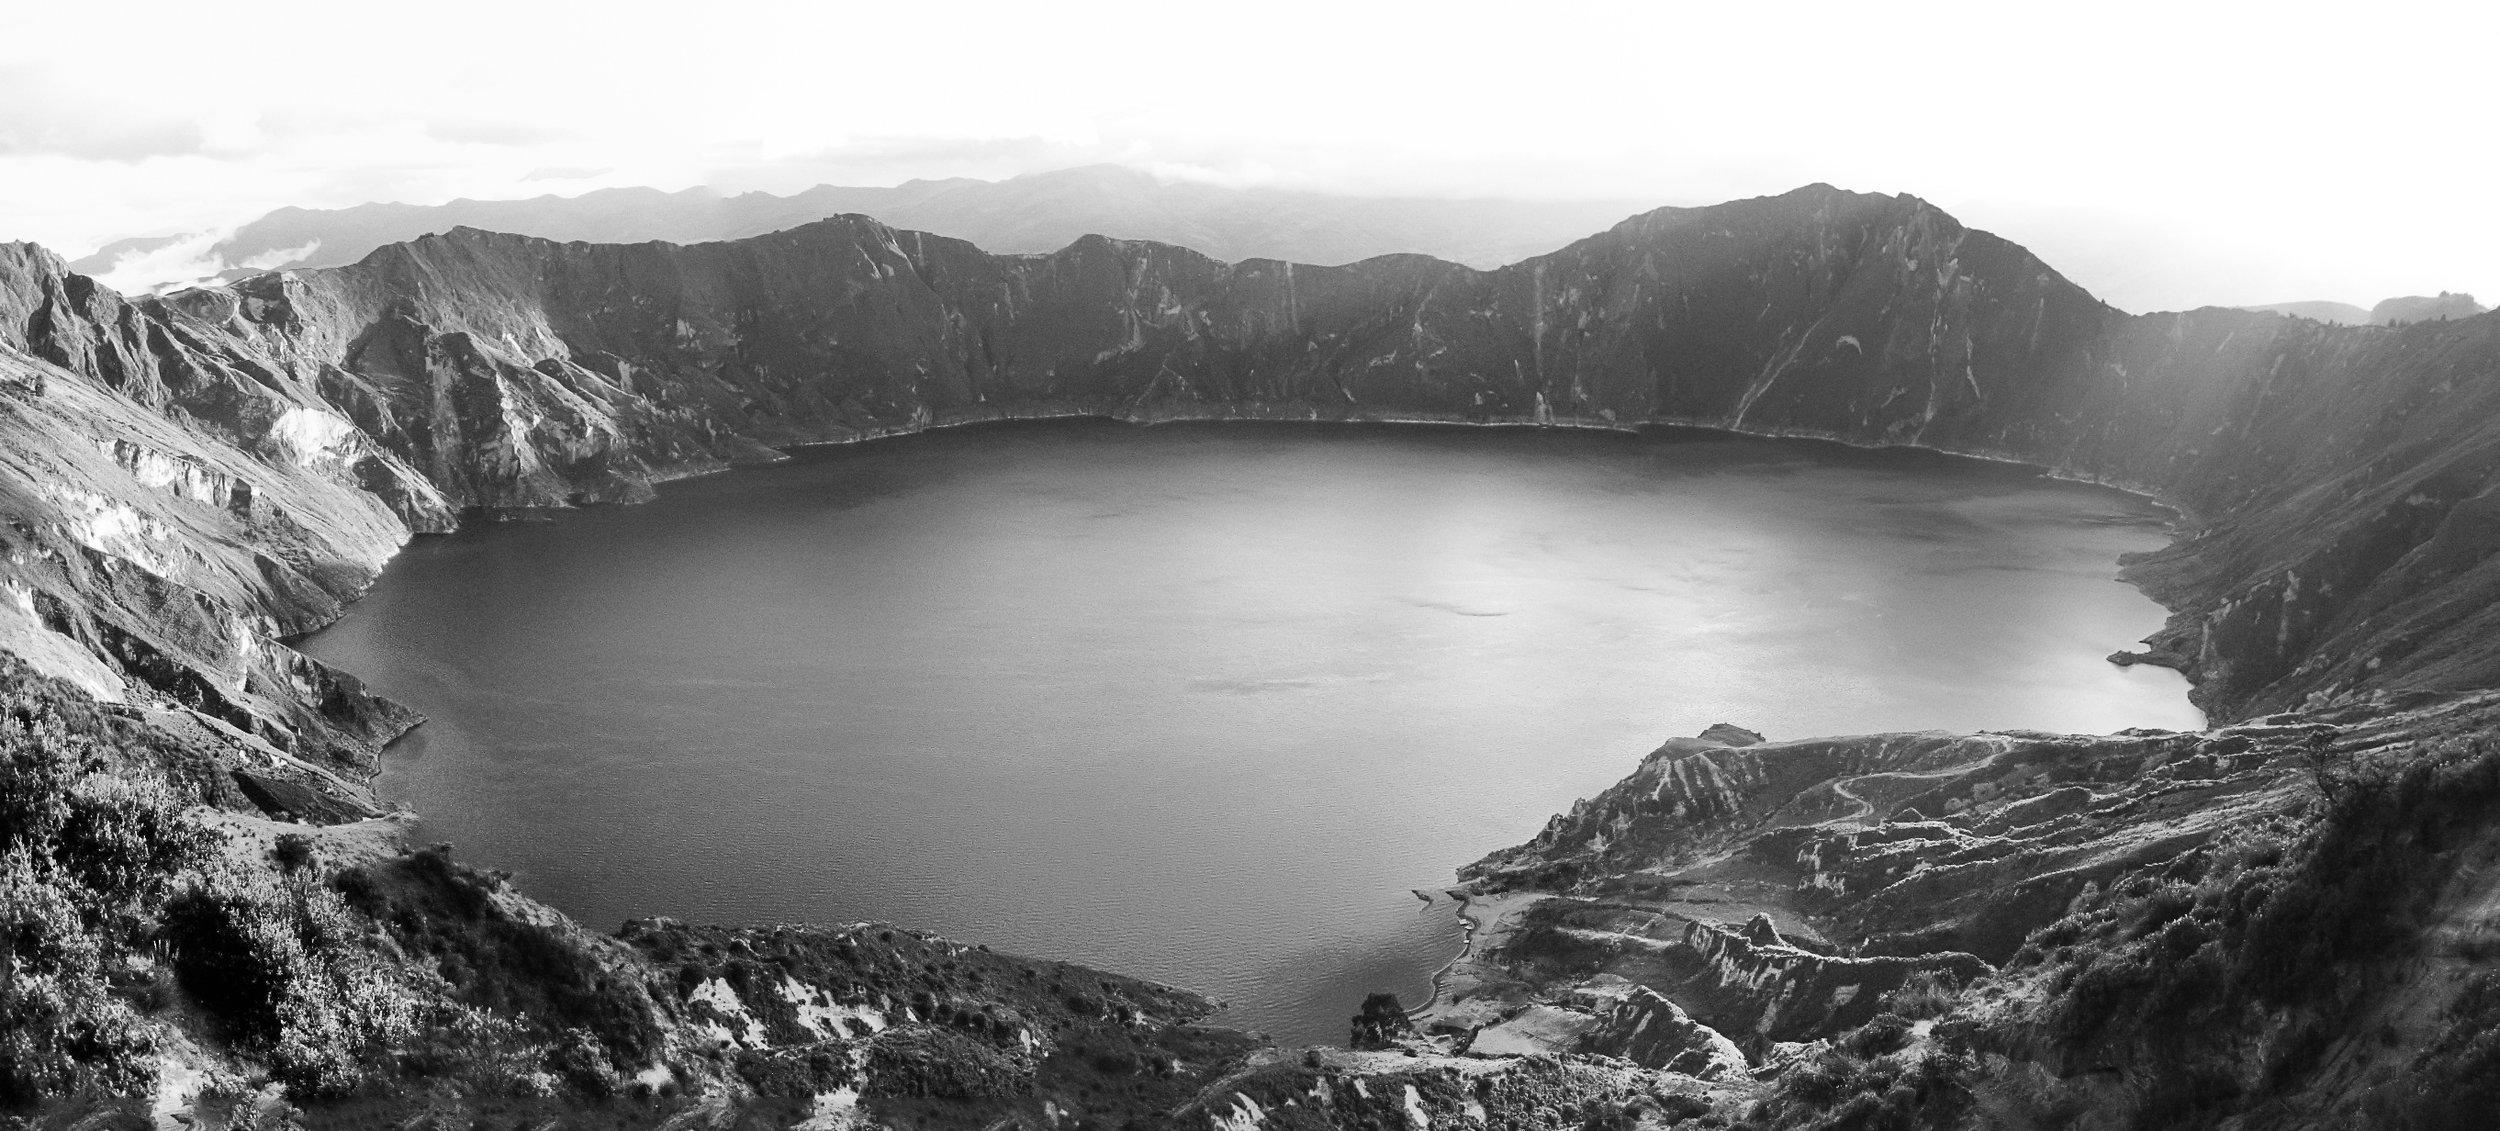 latagunga-to-chugchilan-gringoloop_quilotoacrater-past-guayama-to-chugchilan-9306-8-_crater-panorama-looking-down.jpg